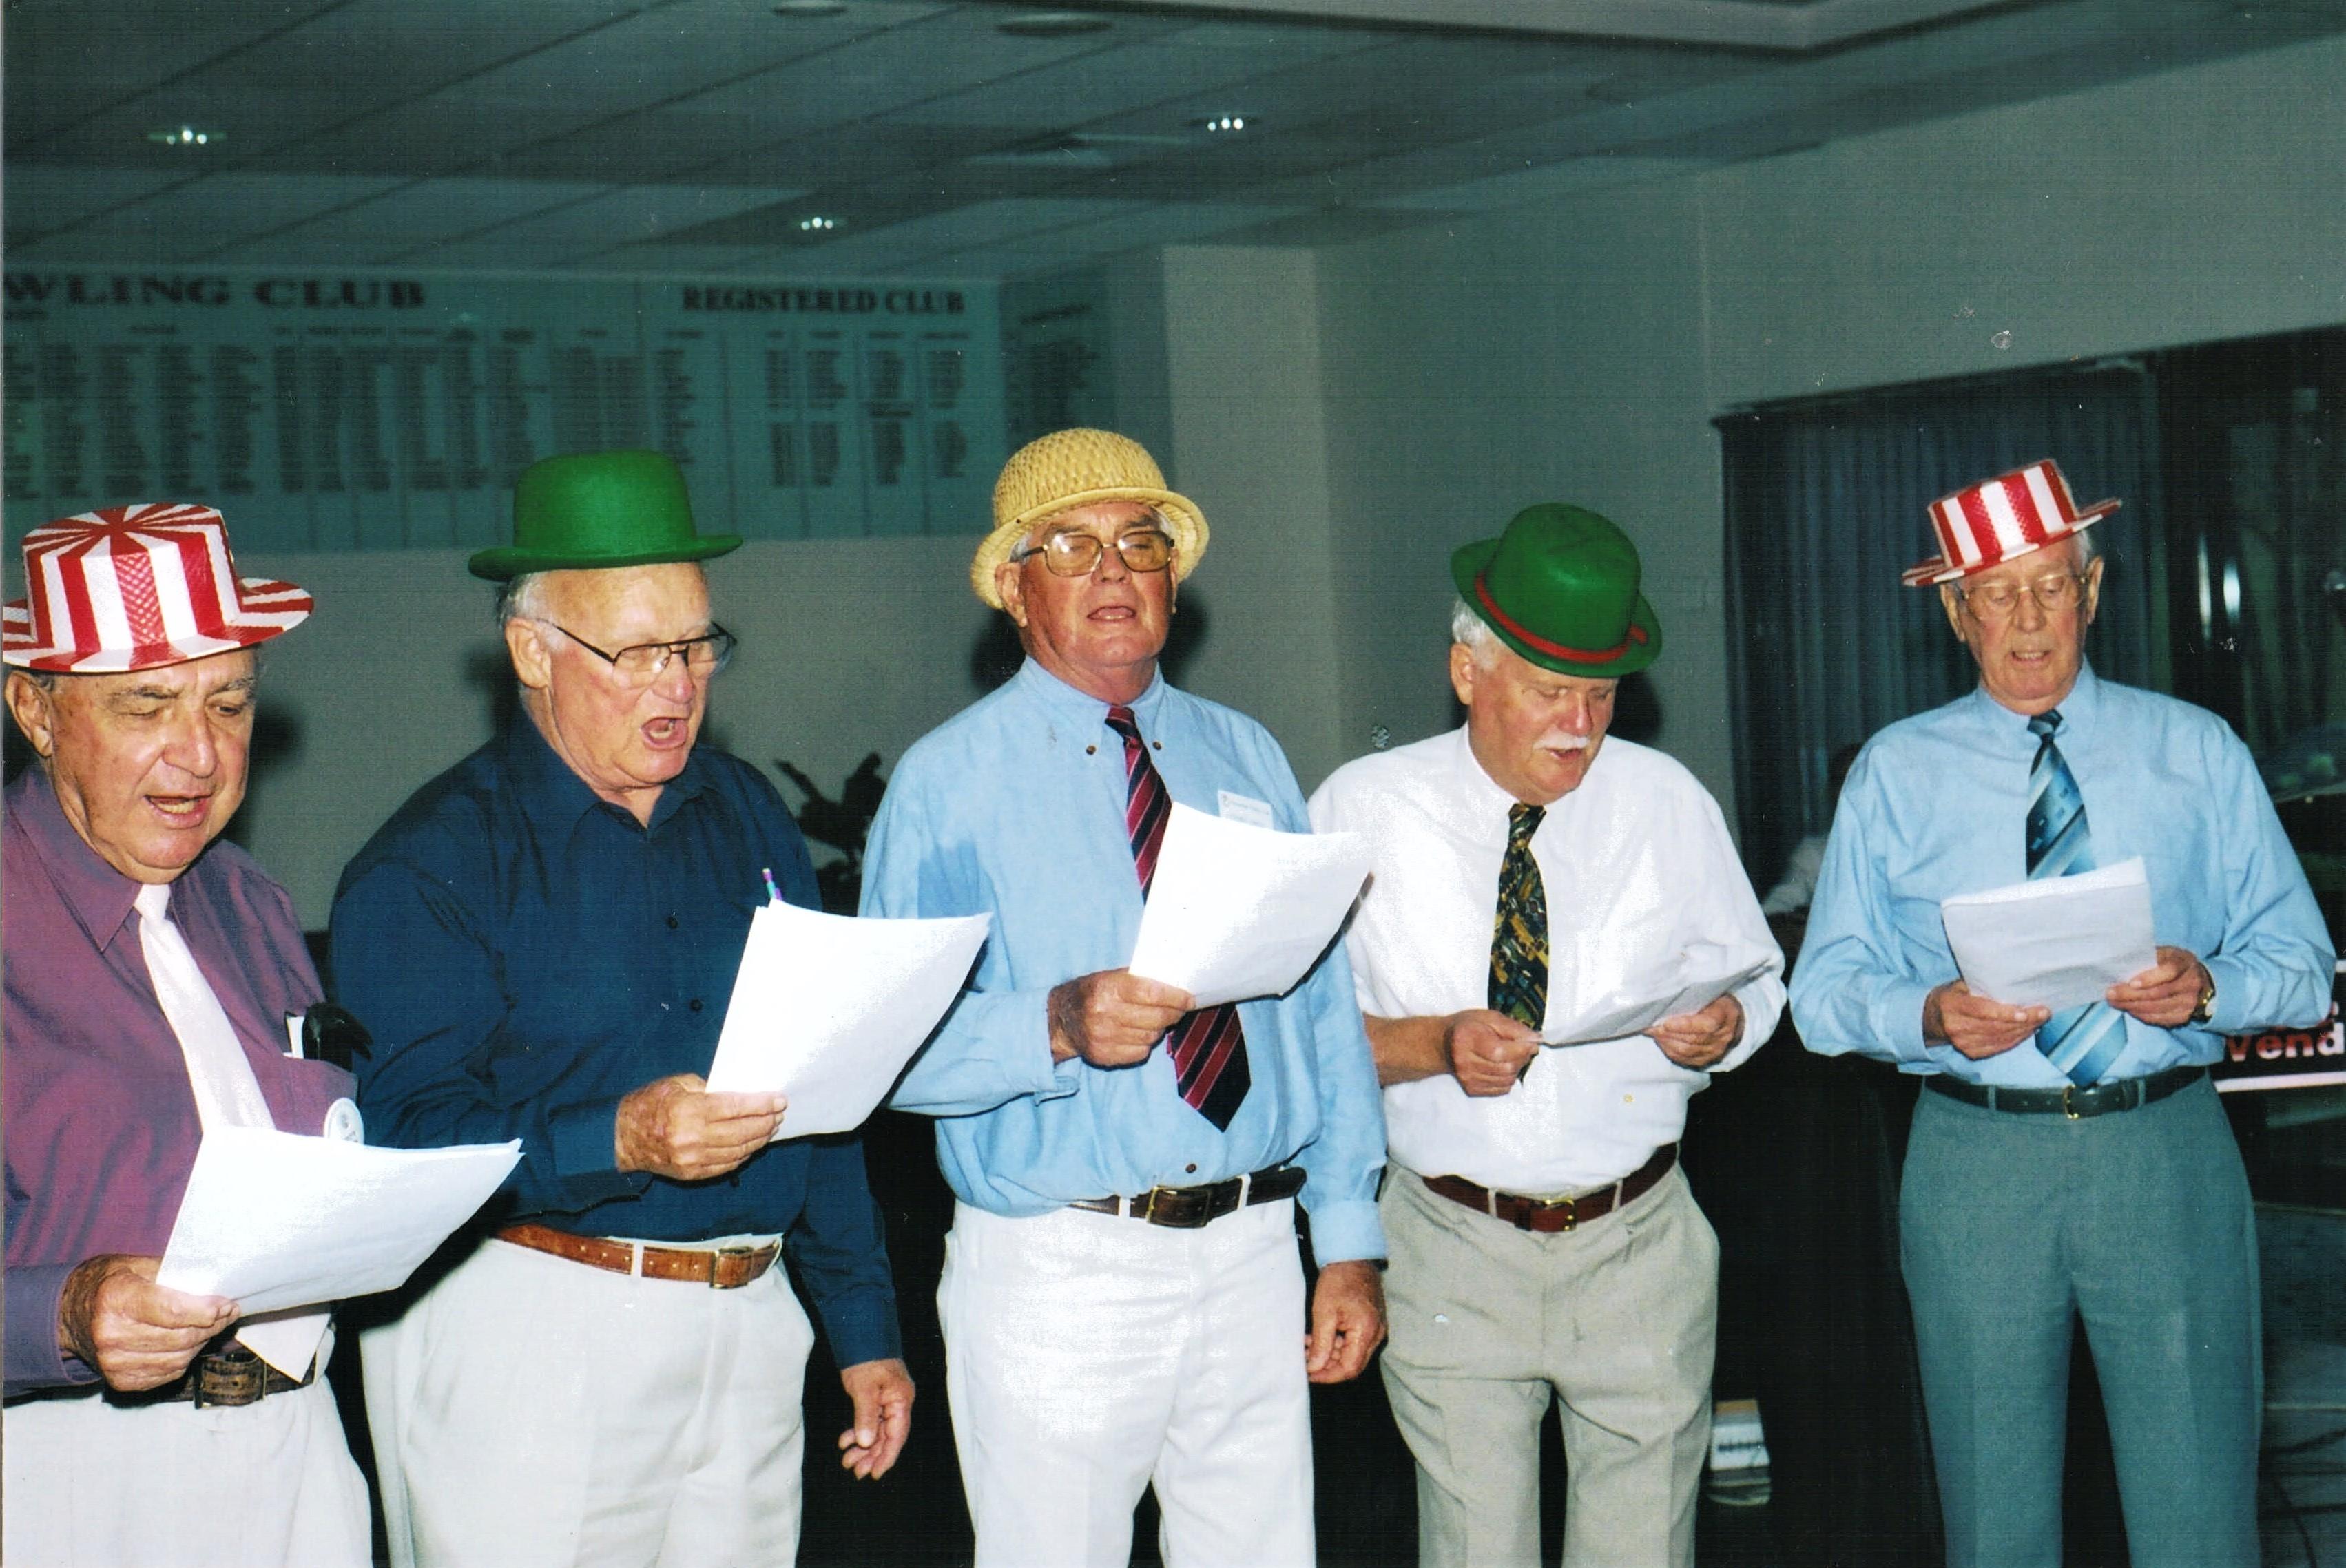 2002 Activities Christmas Luncheon at Av